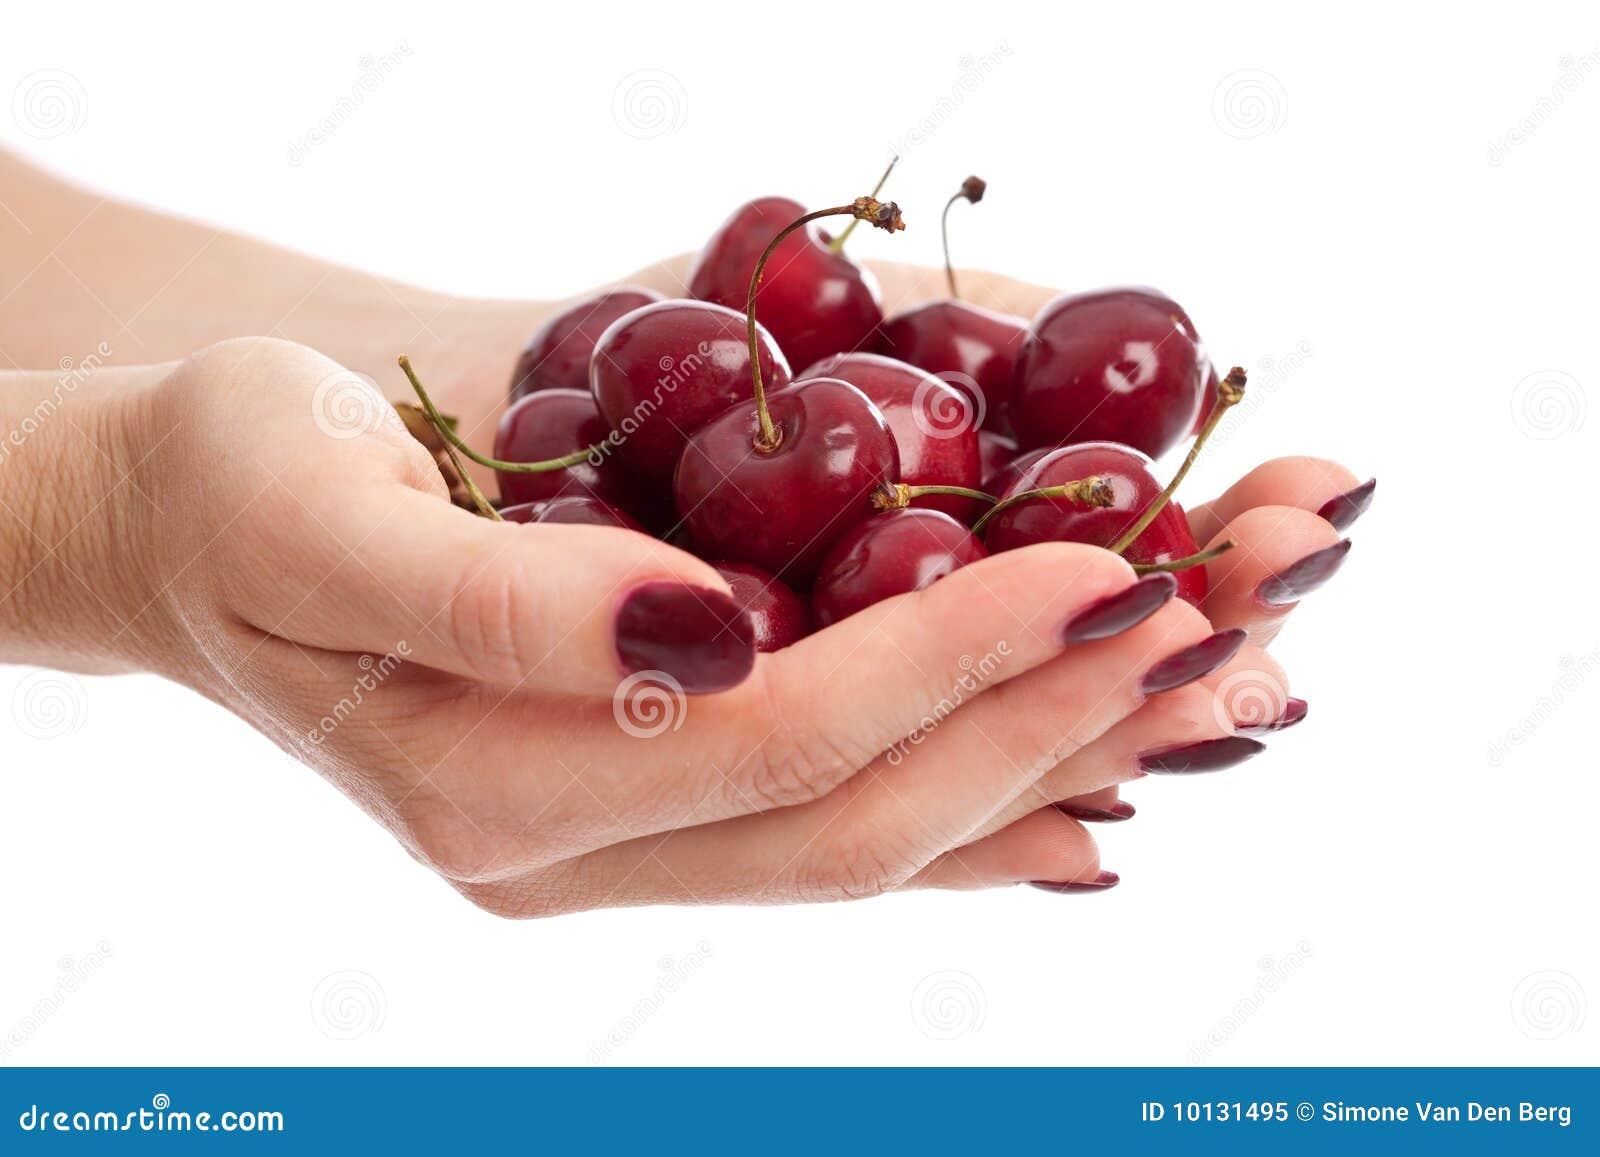 Hands ful of fresh berries